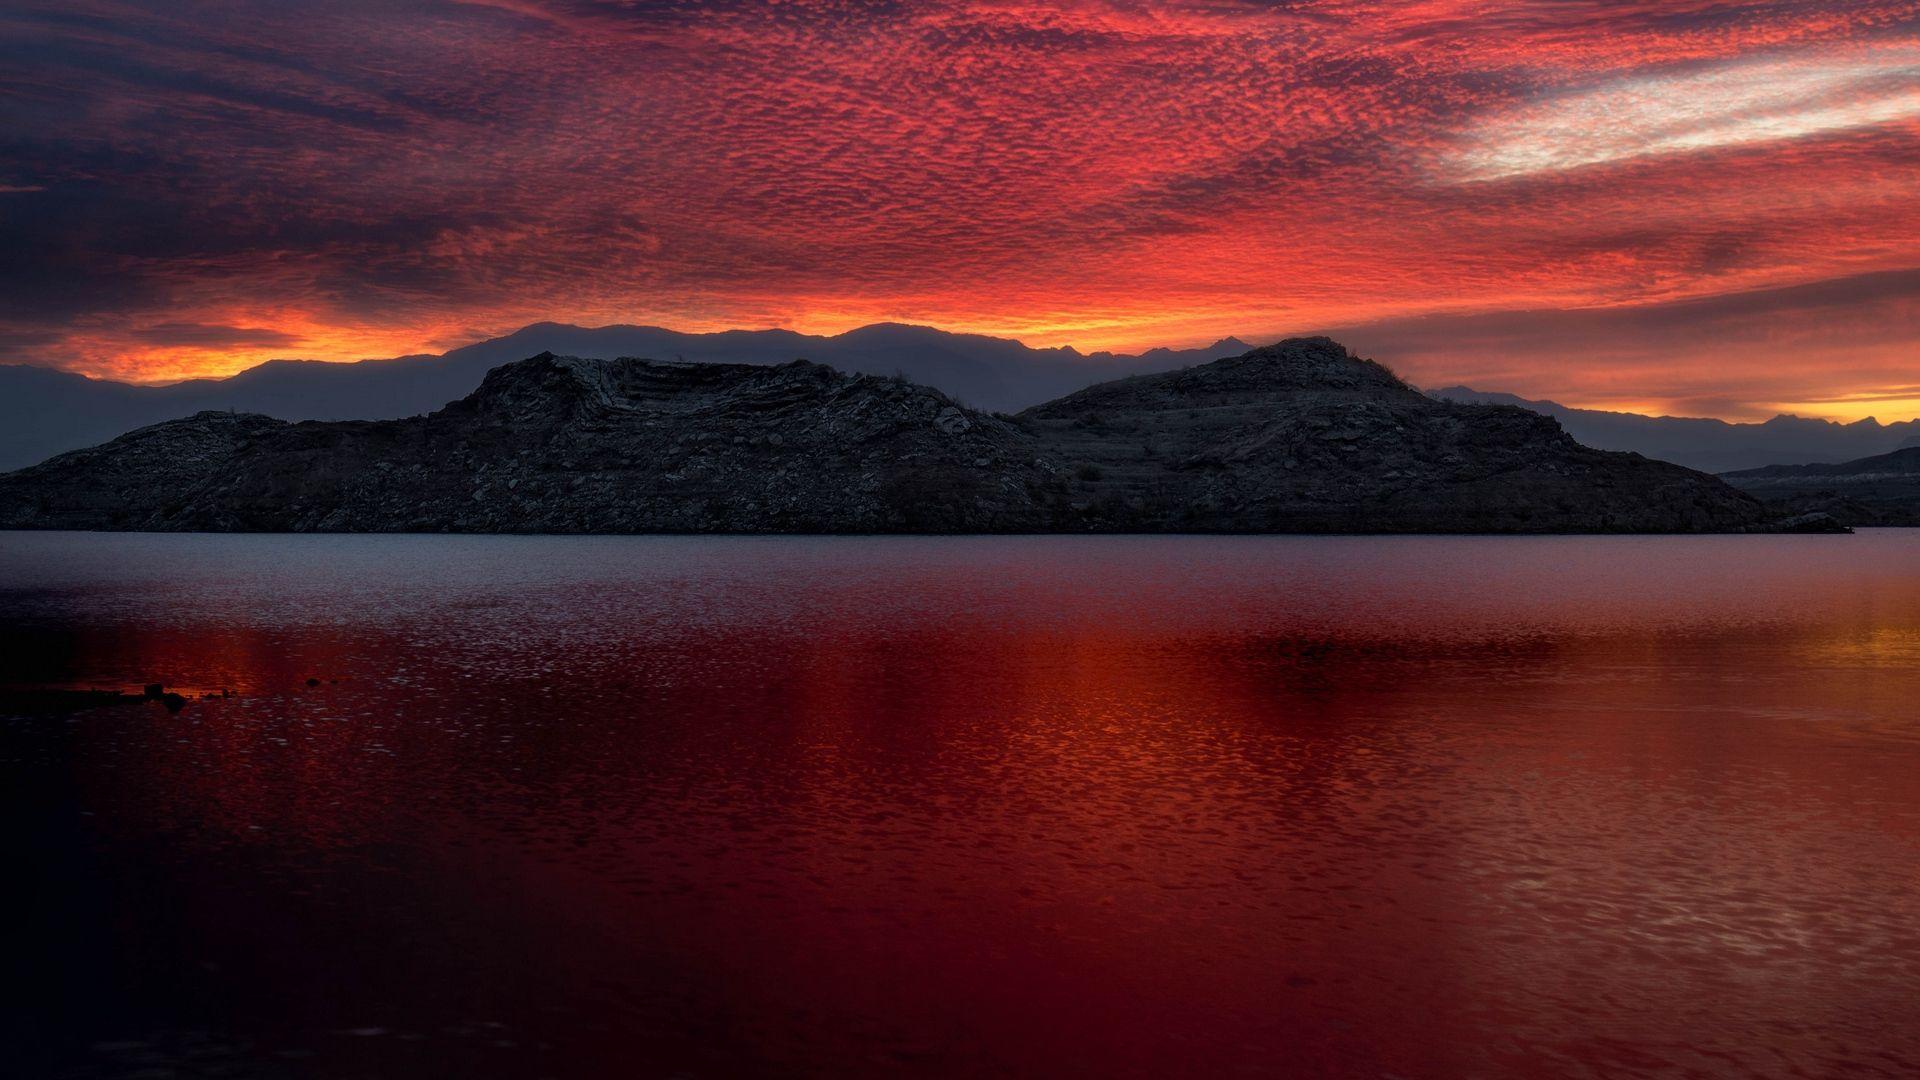 Wallpaper Sunset Usa Lake Mead Mountains Sunset Lake Mead Mountains Wallpaper sea dusk mountains sunset lake